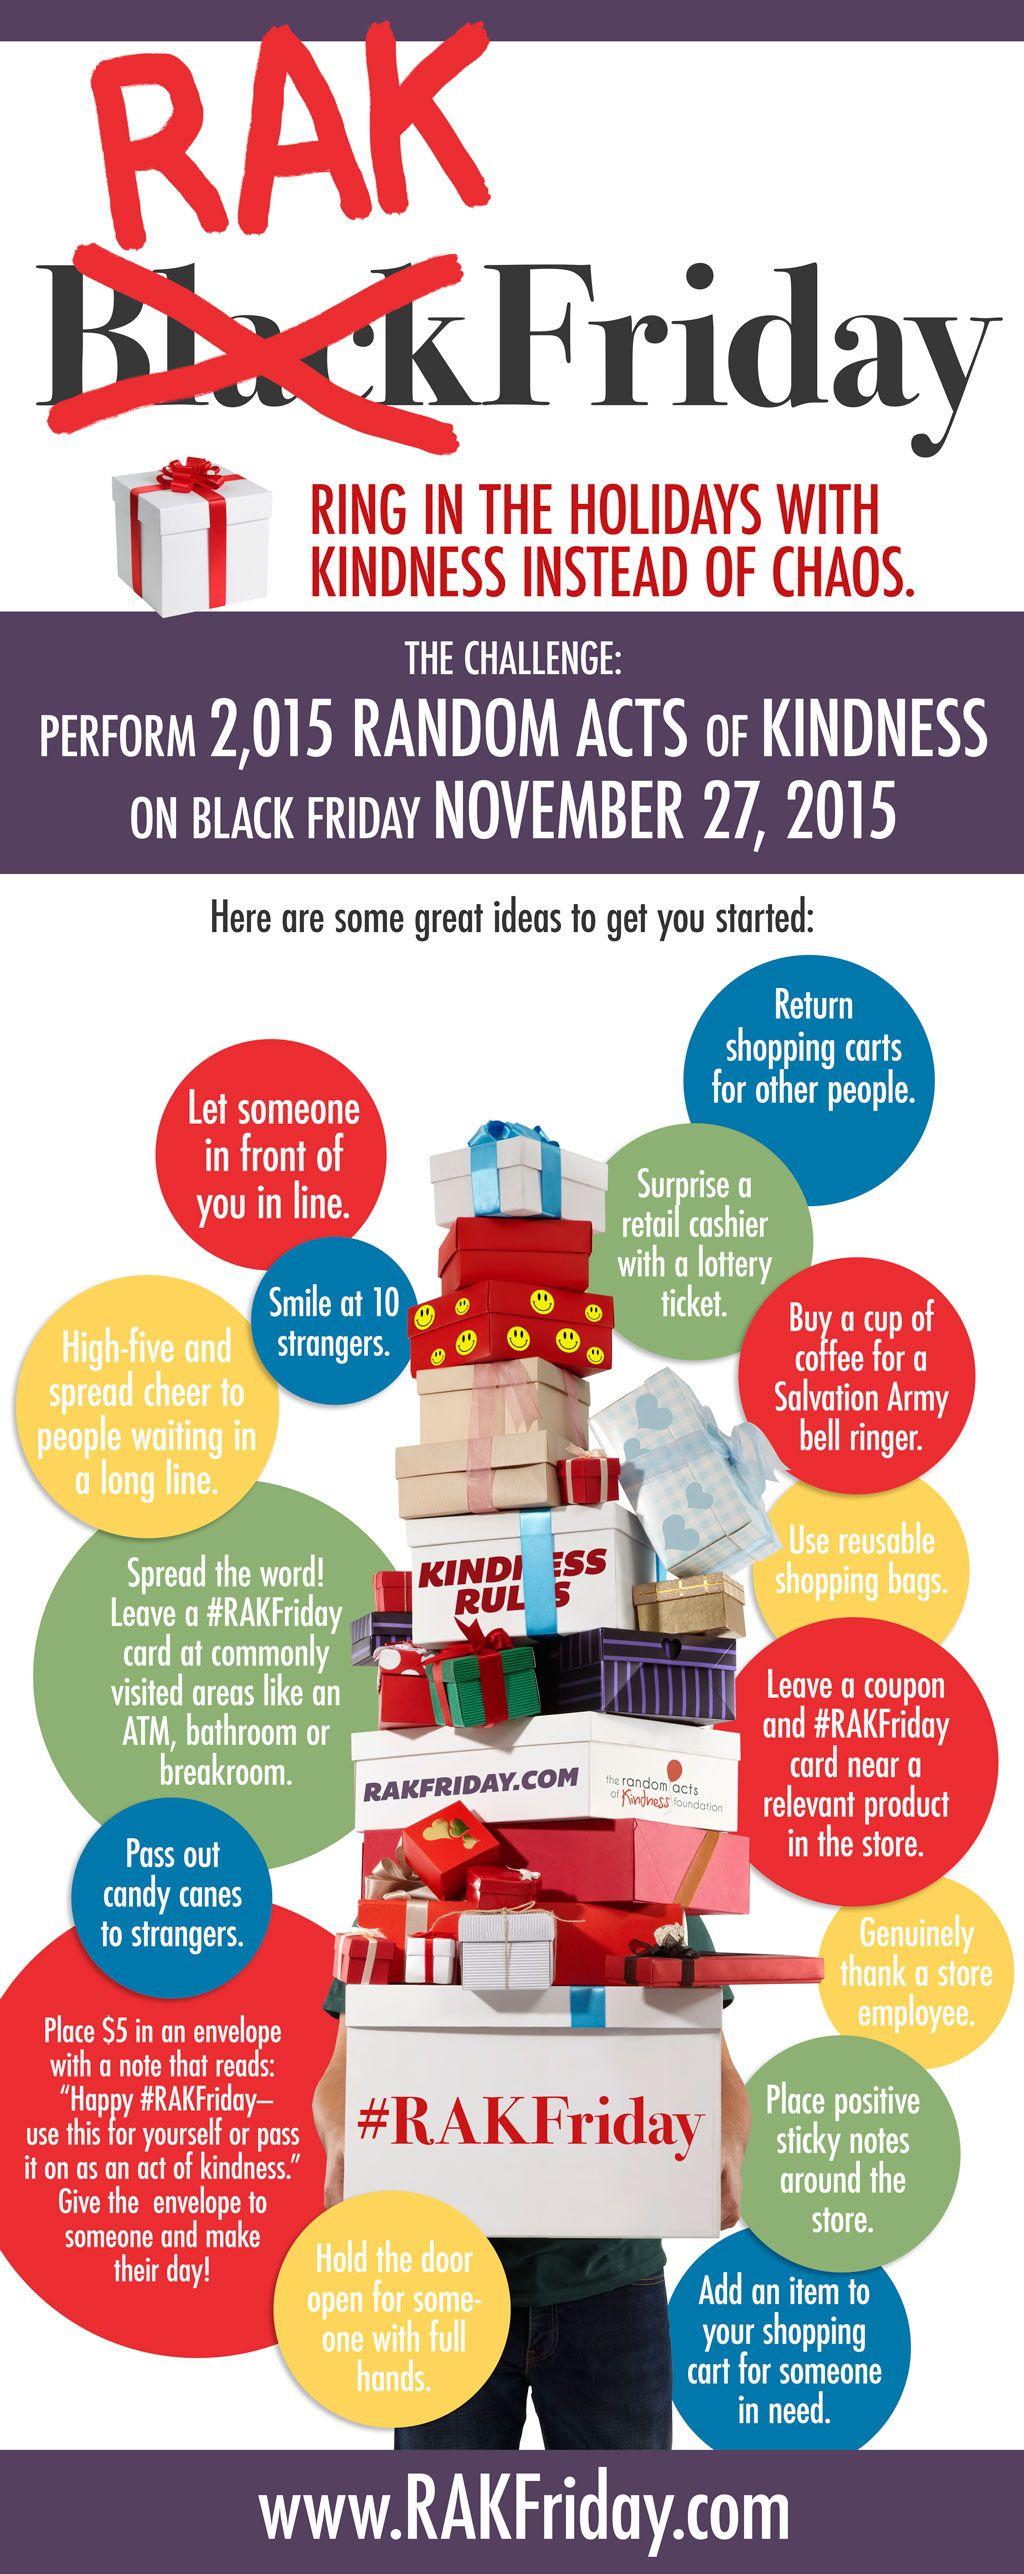 10 Ideas For Rakfriday On Nov 27 Let S Perform 2 015 Random Acts Of Kindness